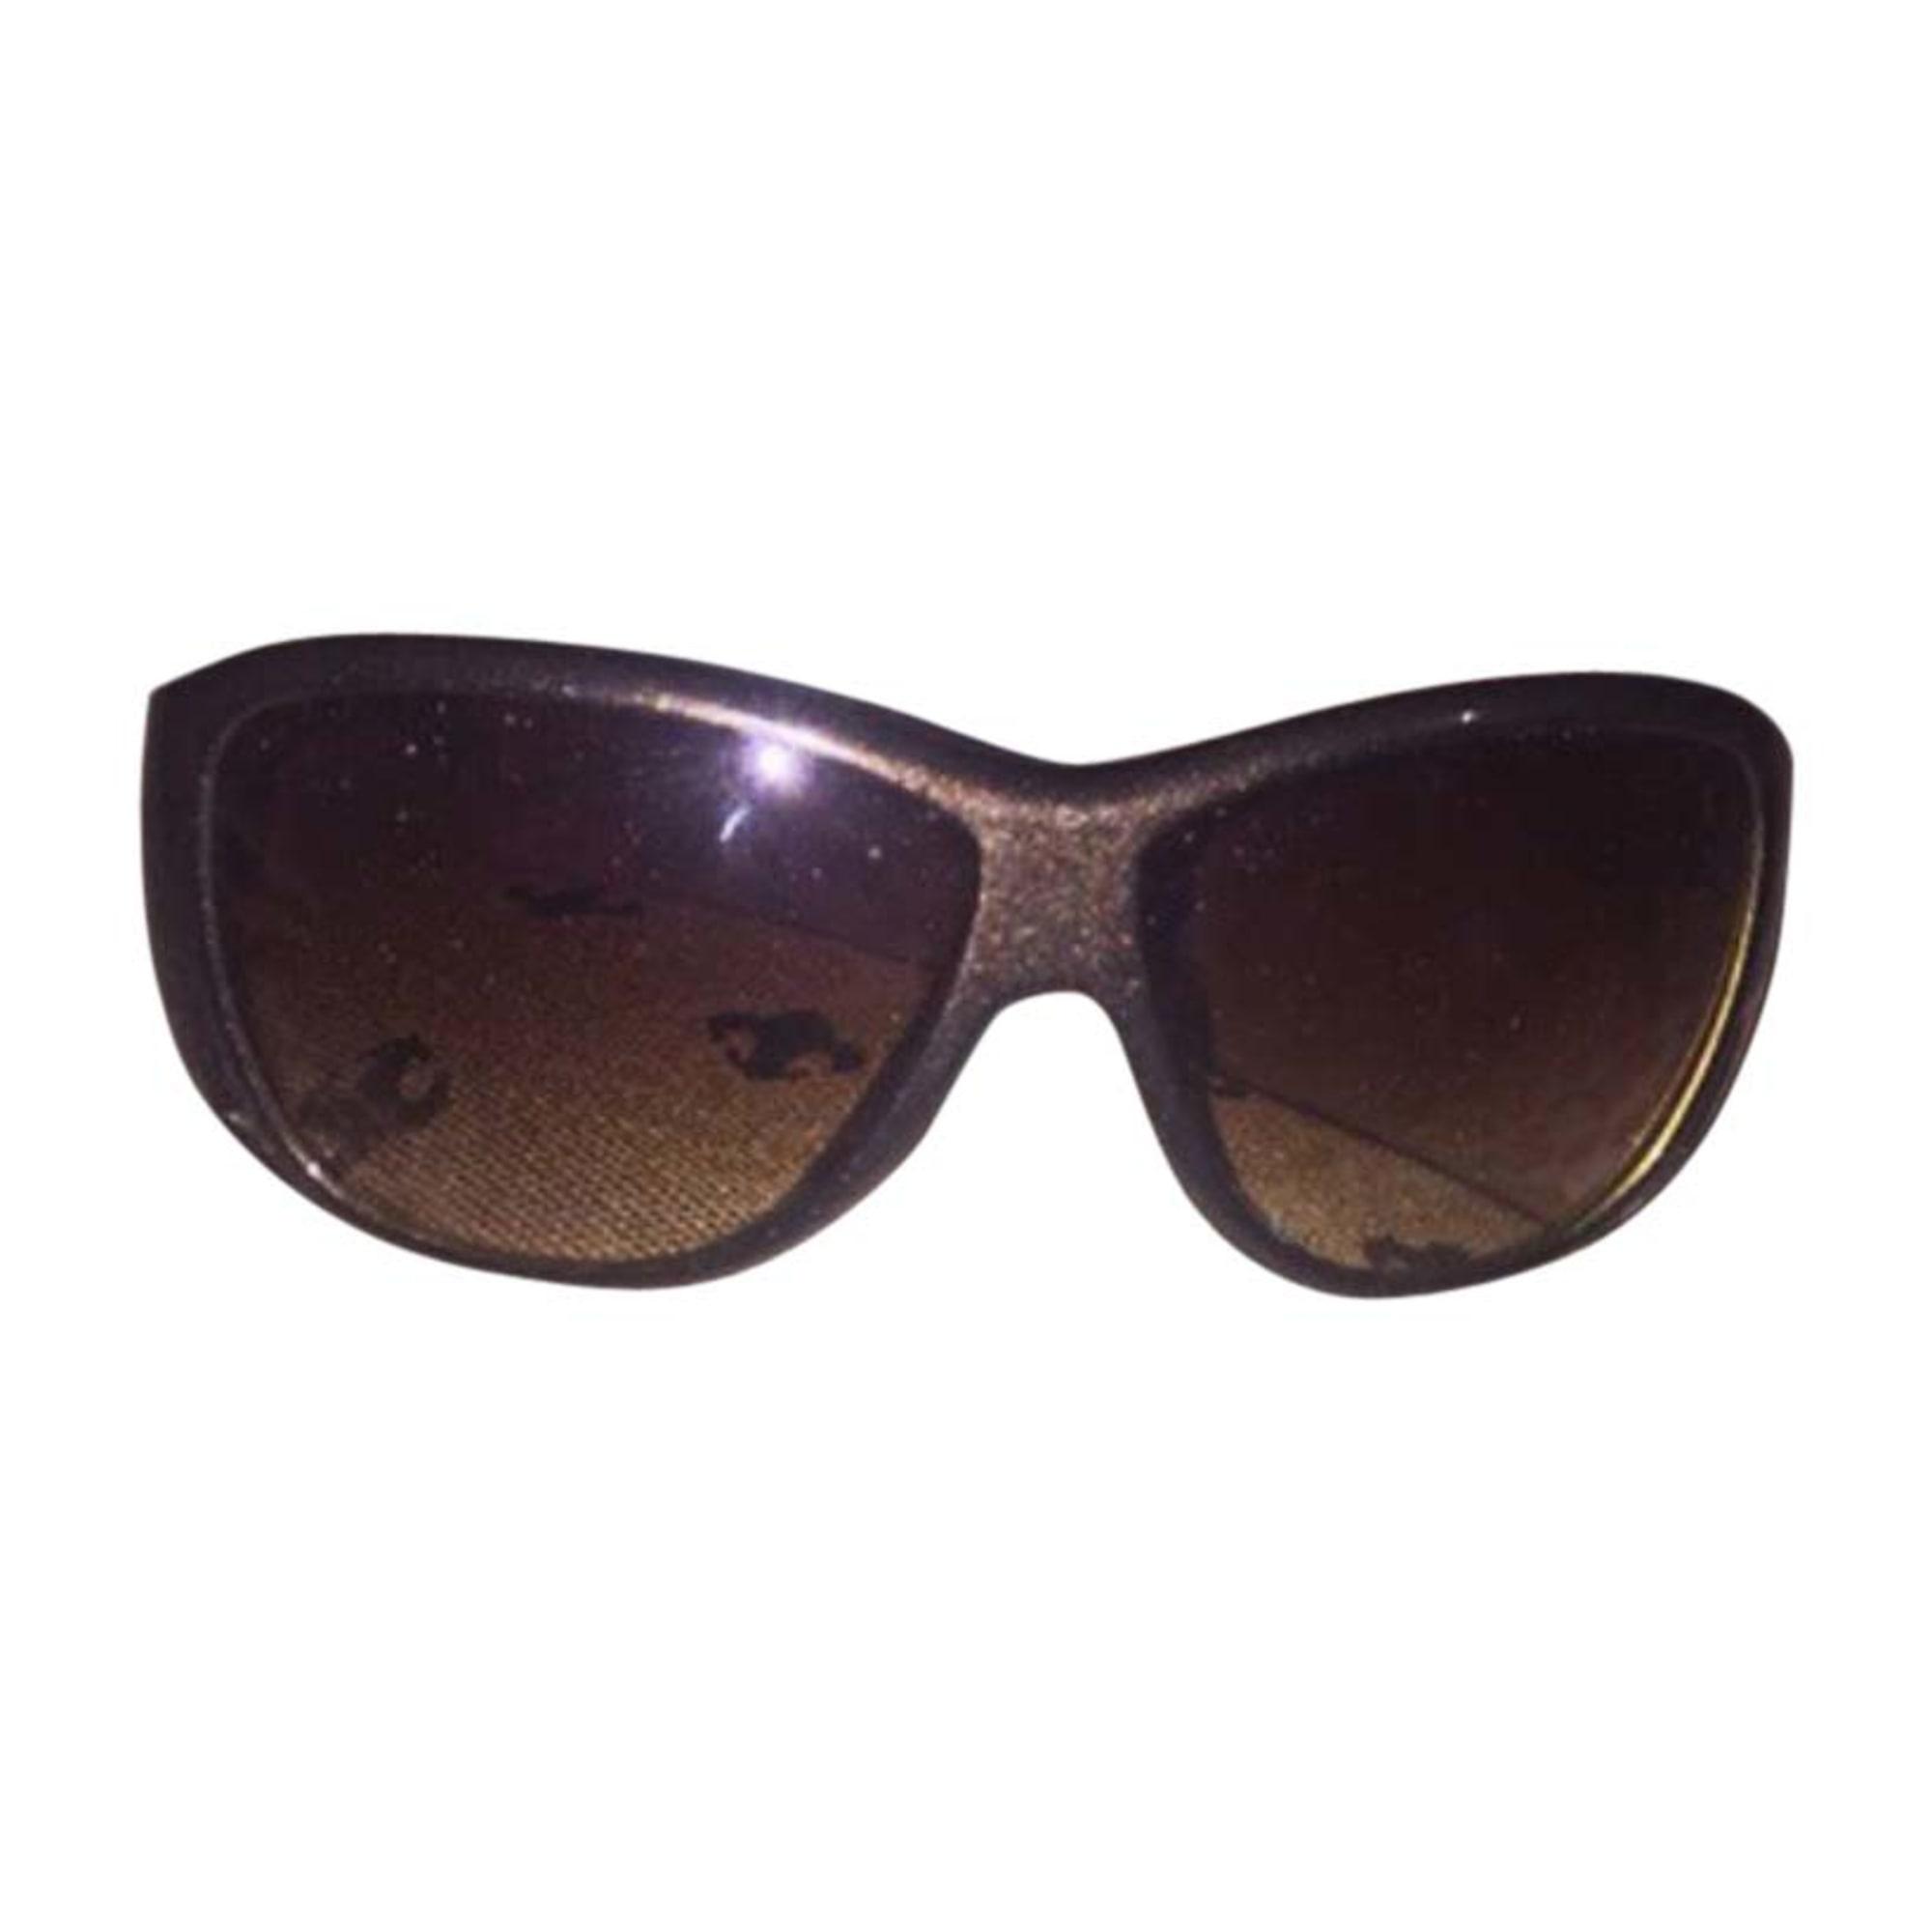 1817fb7de9ad Sonnenbrille JUST CAVALLI Gold, Bronze, Kupfer